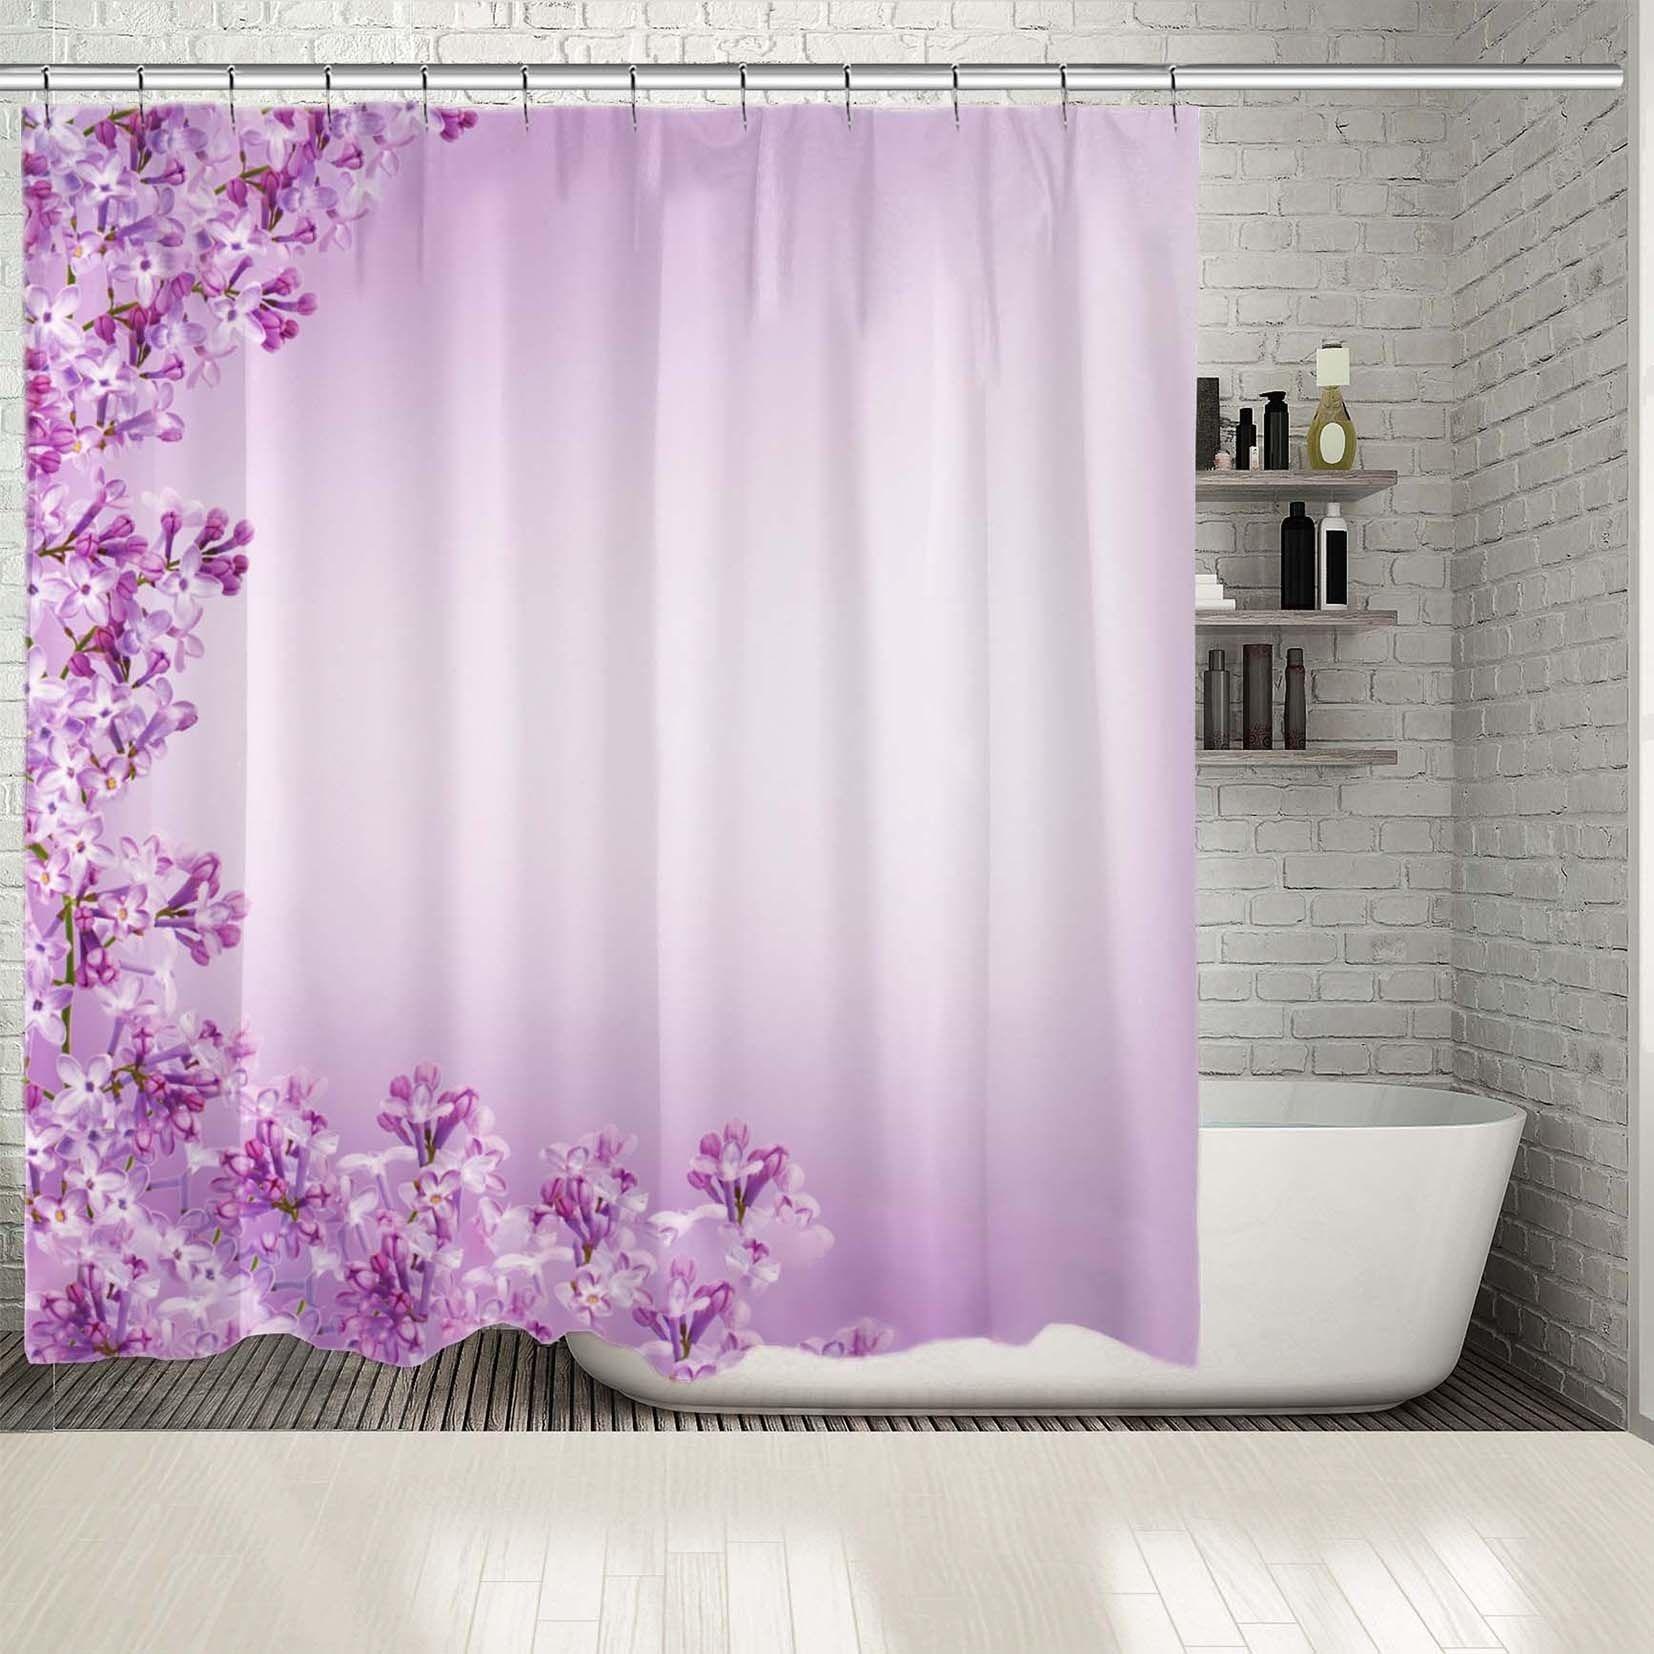 shower curtain lilac flowers spring garden blossom seasonal nature decorative photo printed purple white